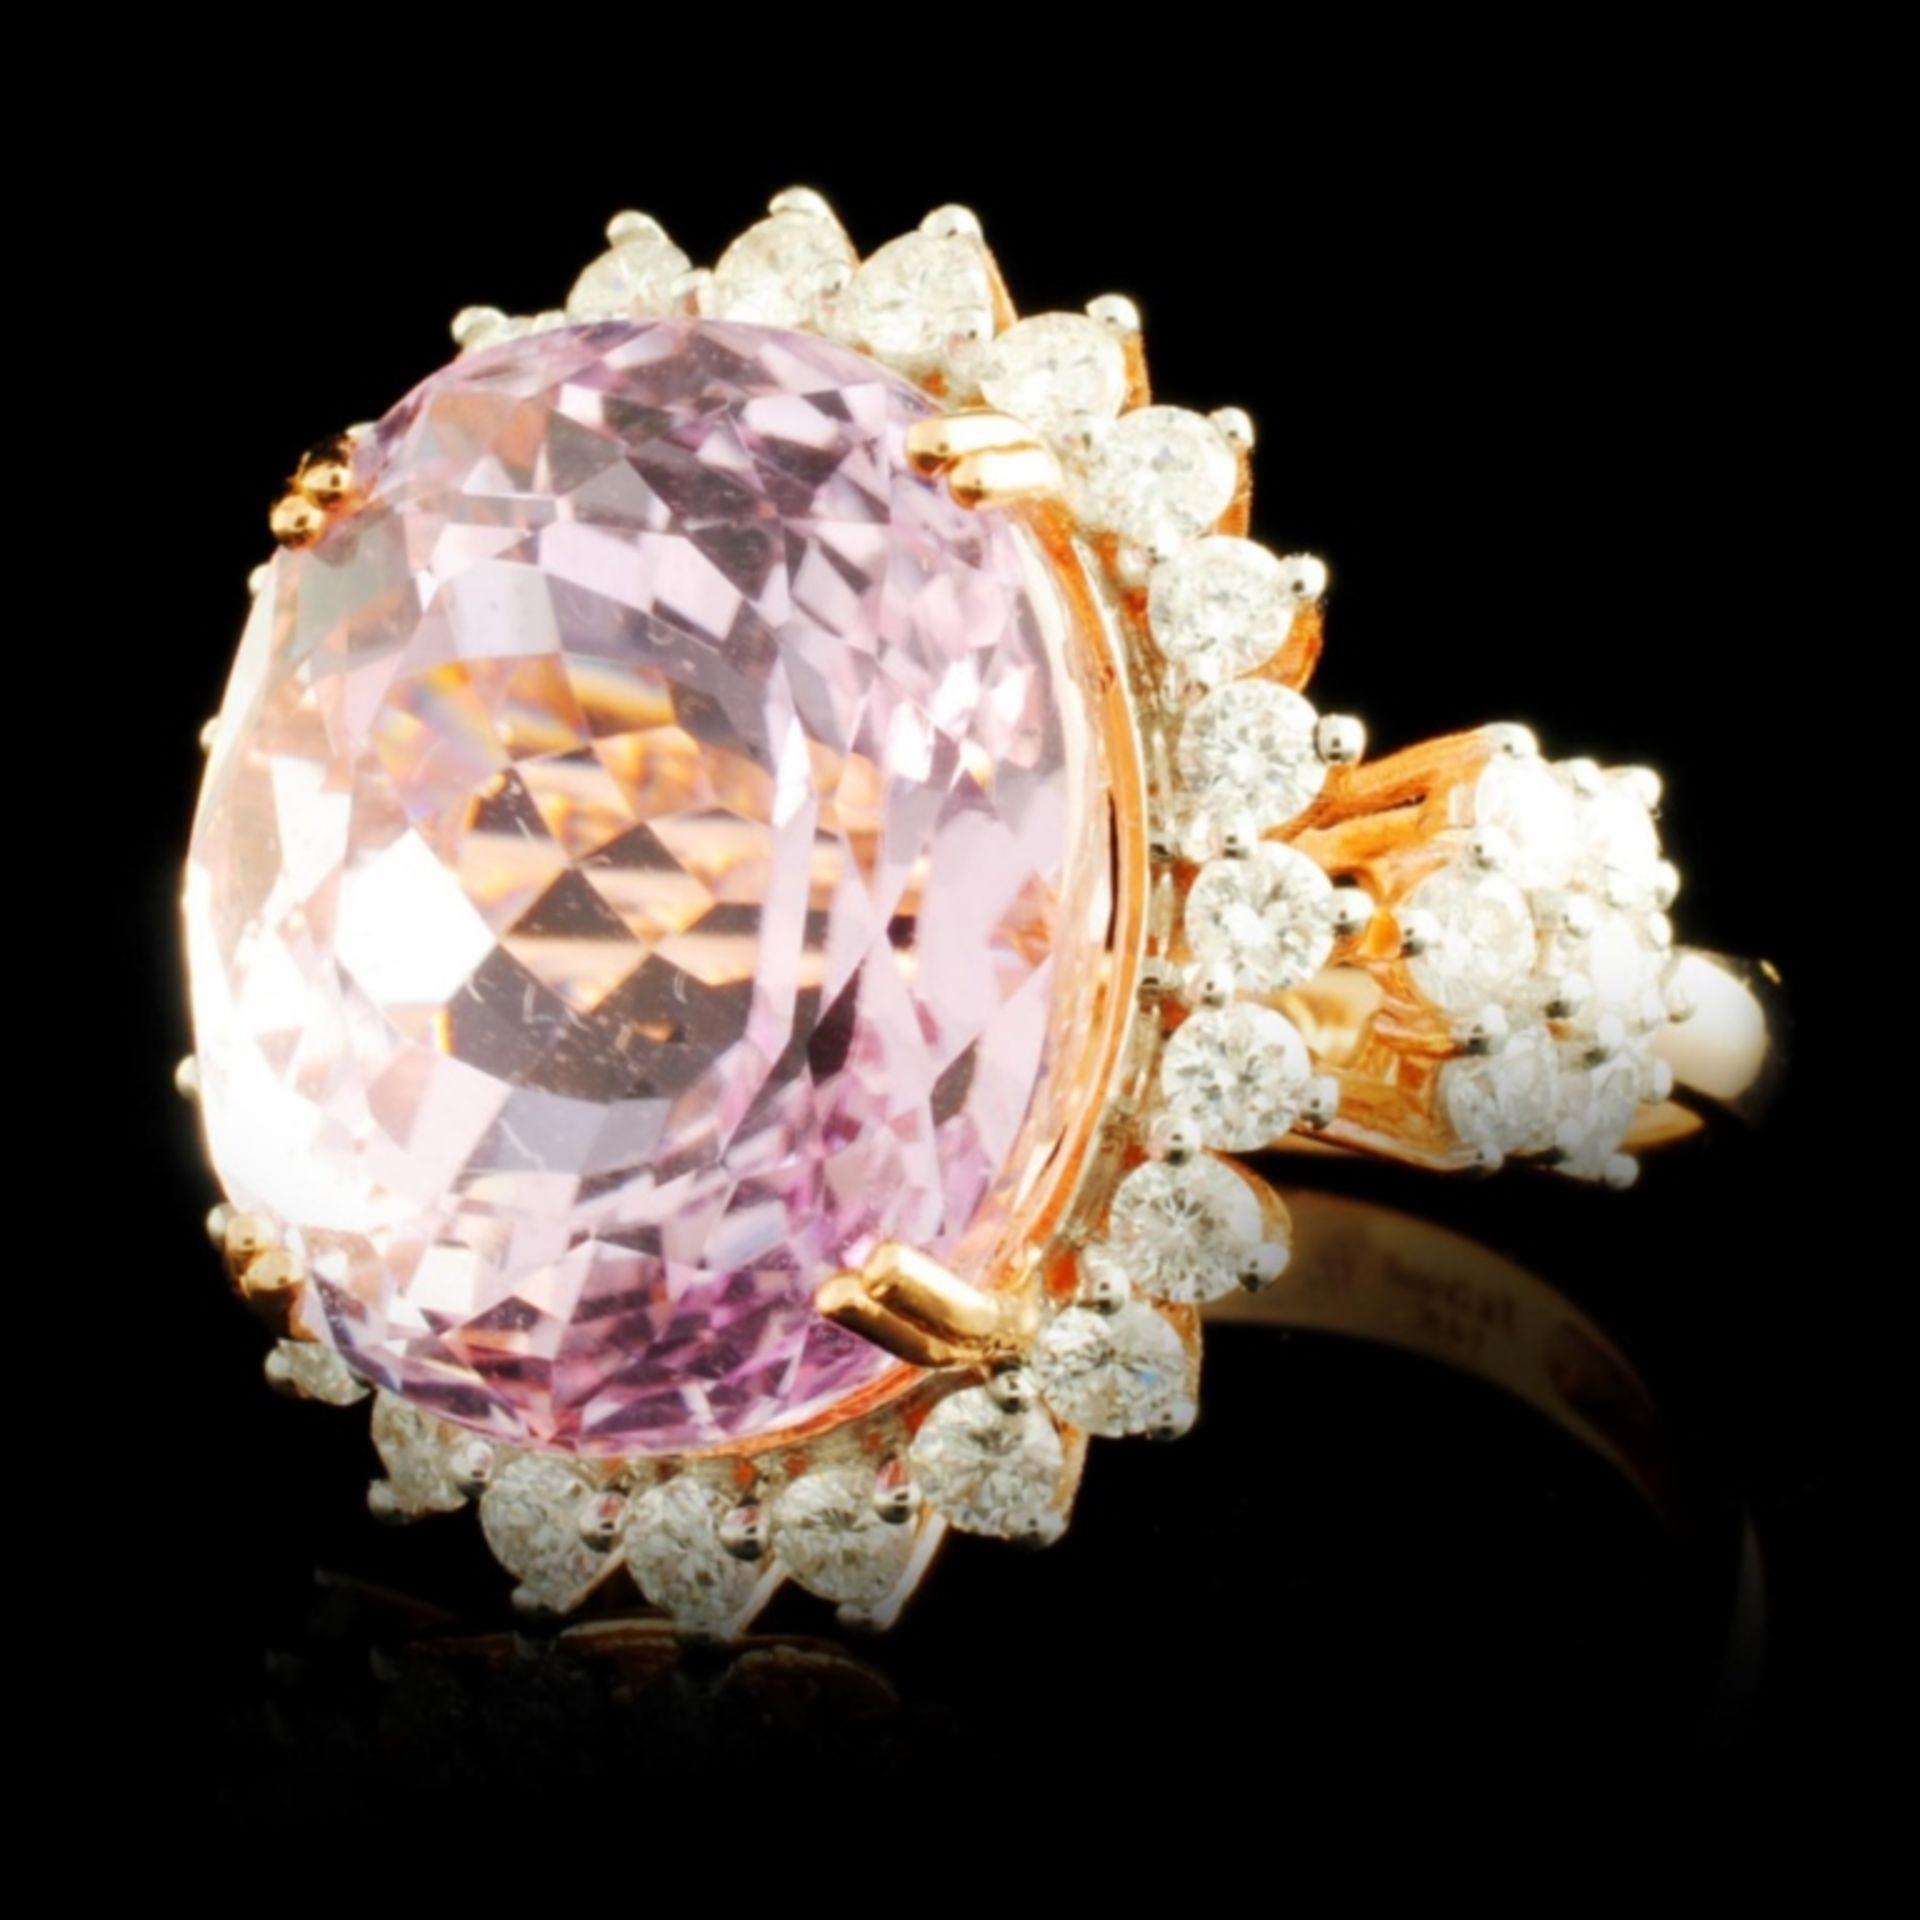 14K Gold 17.00ct Kunzite & 1.32ctw Diamond Ring - Image 2 of 5